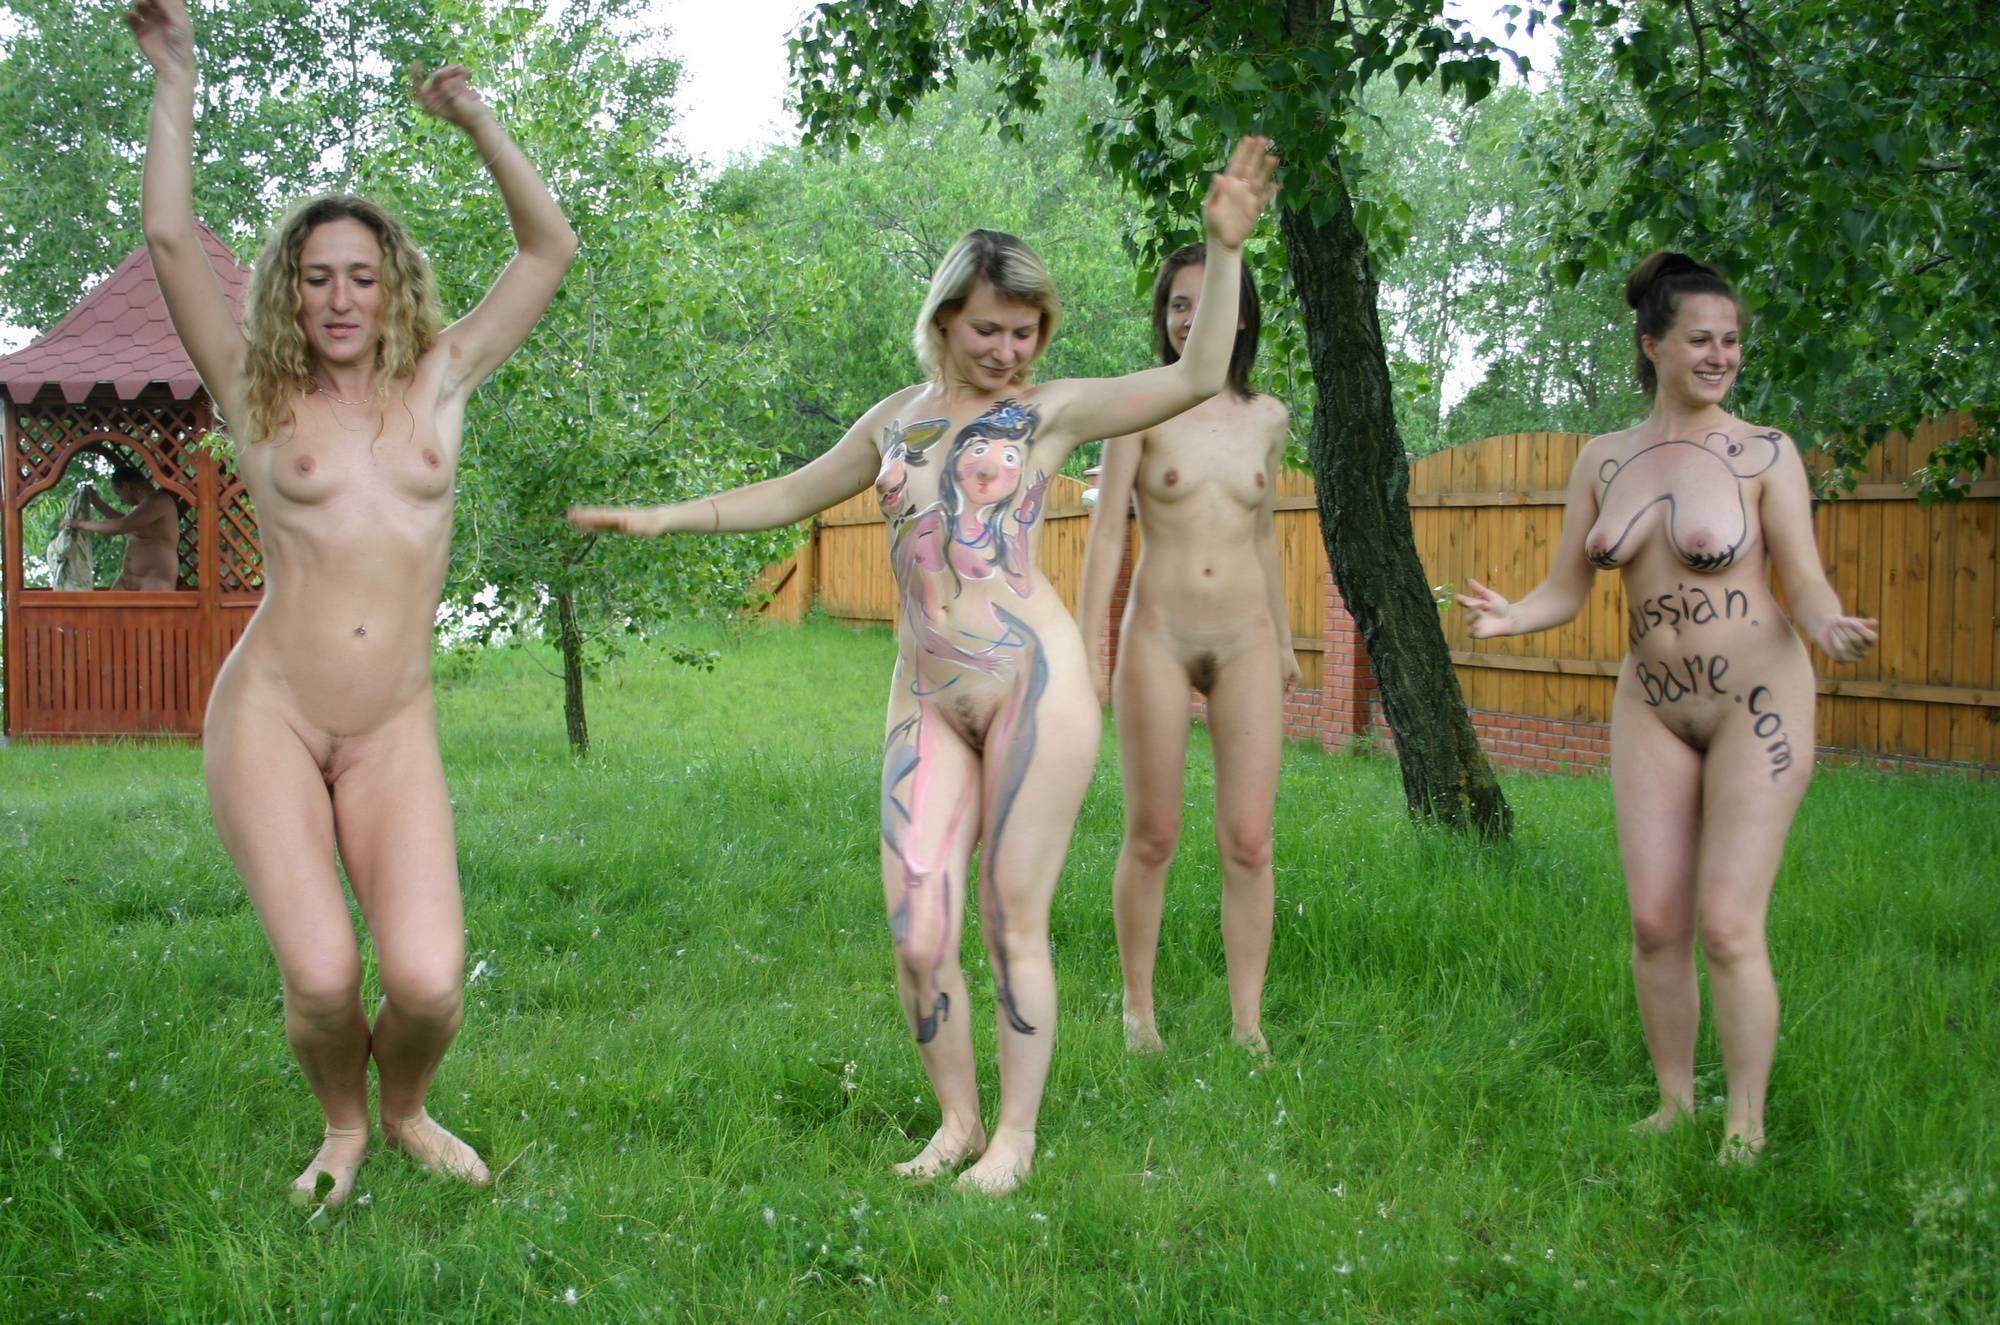 Purenudism Photos Kiev Backyard Greens Play - 1